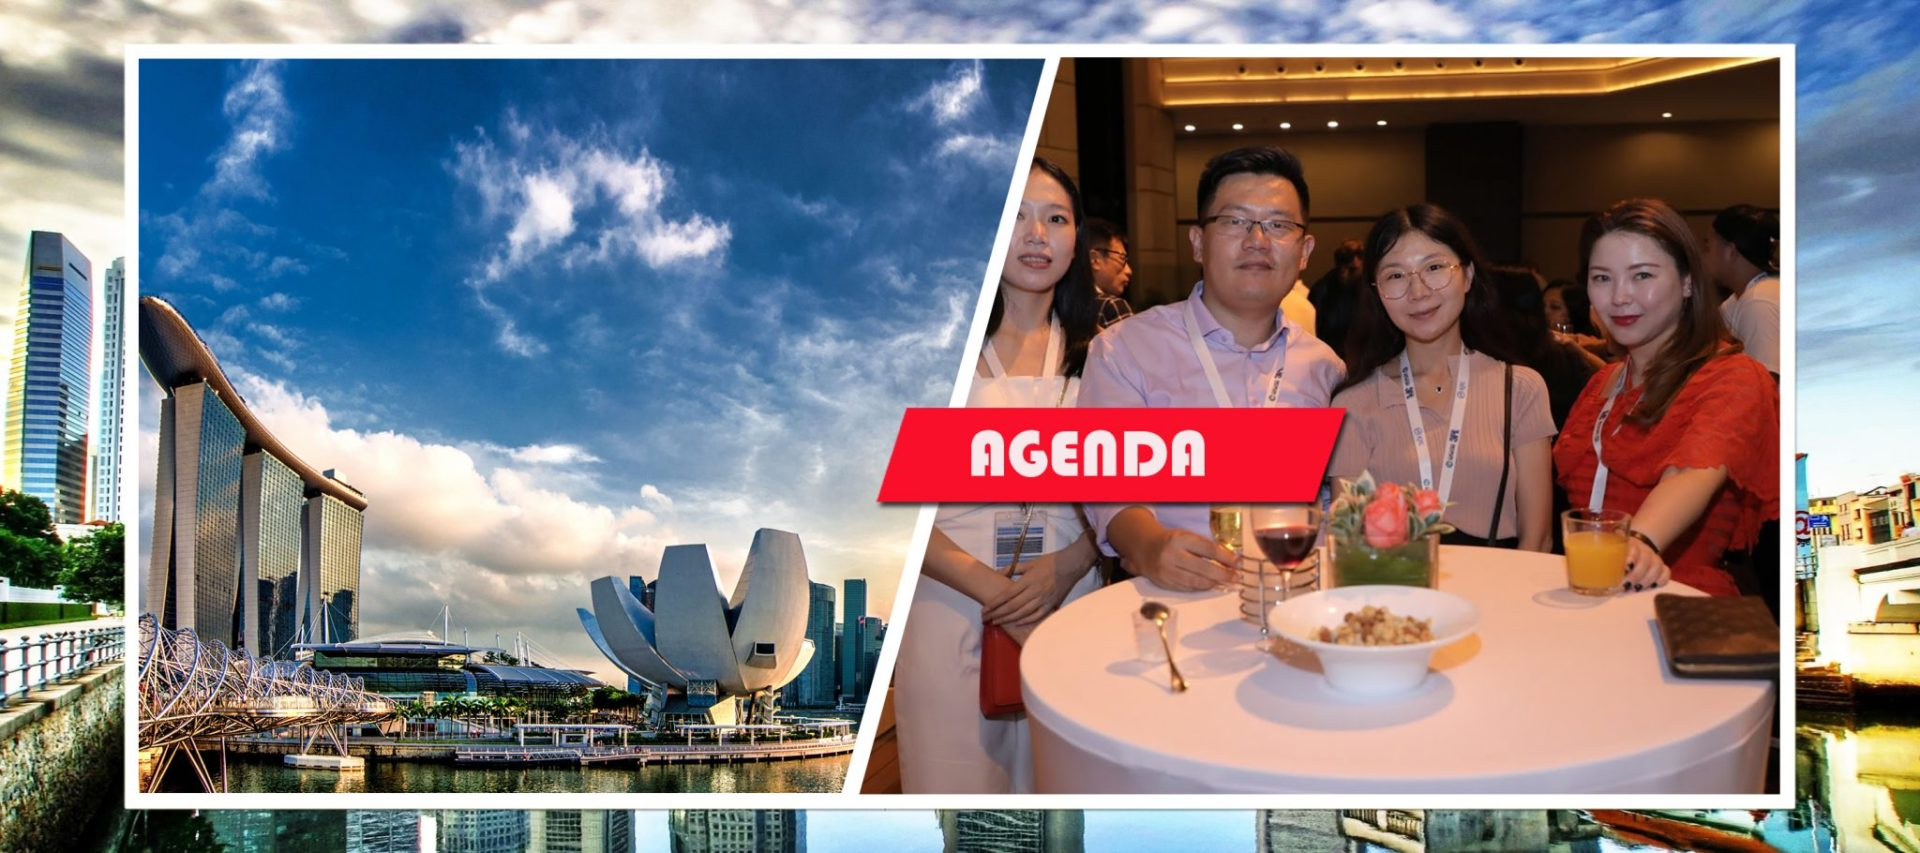 Agenda_PLN_2020-1-2048x910